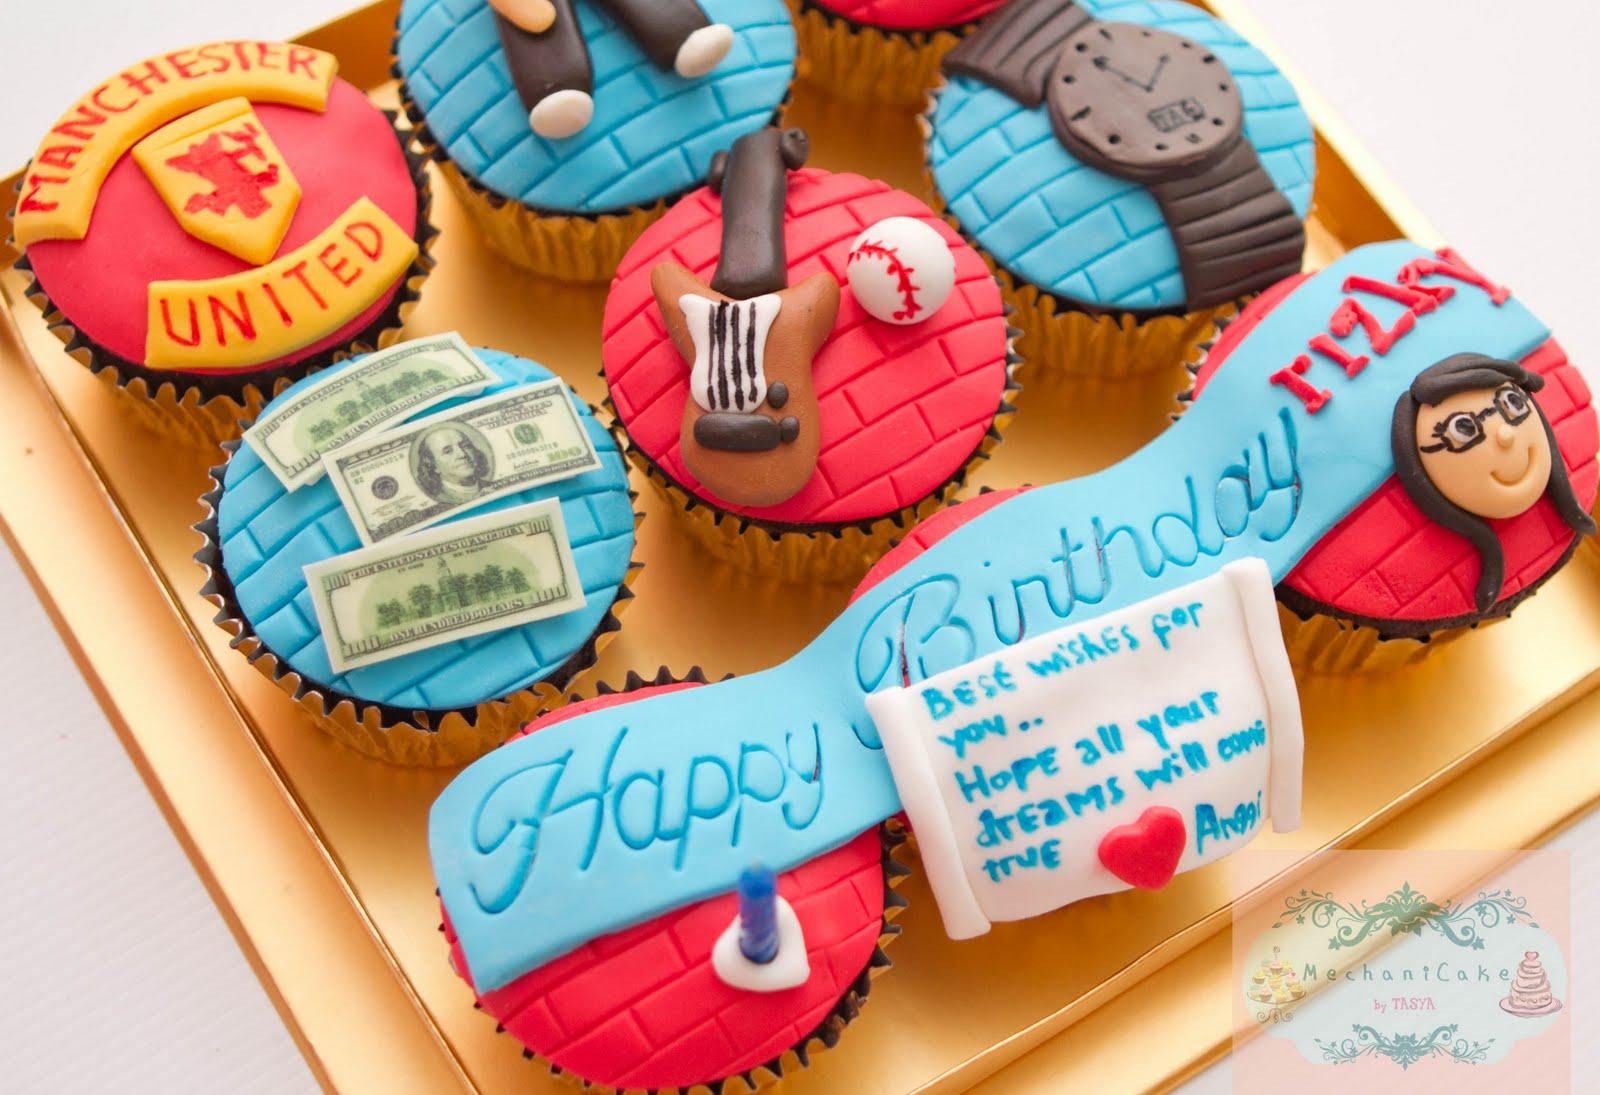 MechaniCake: Birthday cupcake set for Rizky